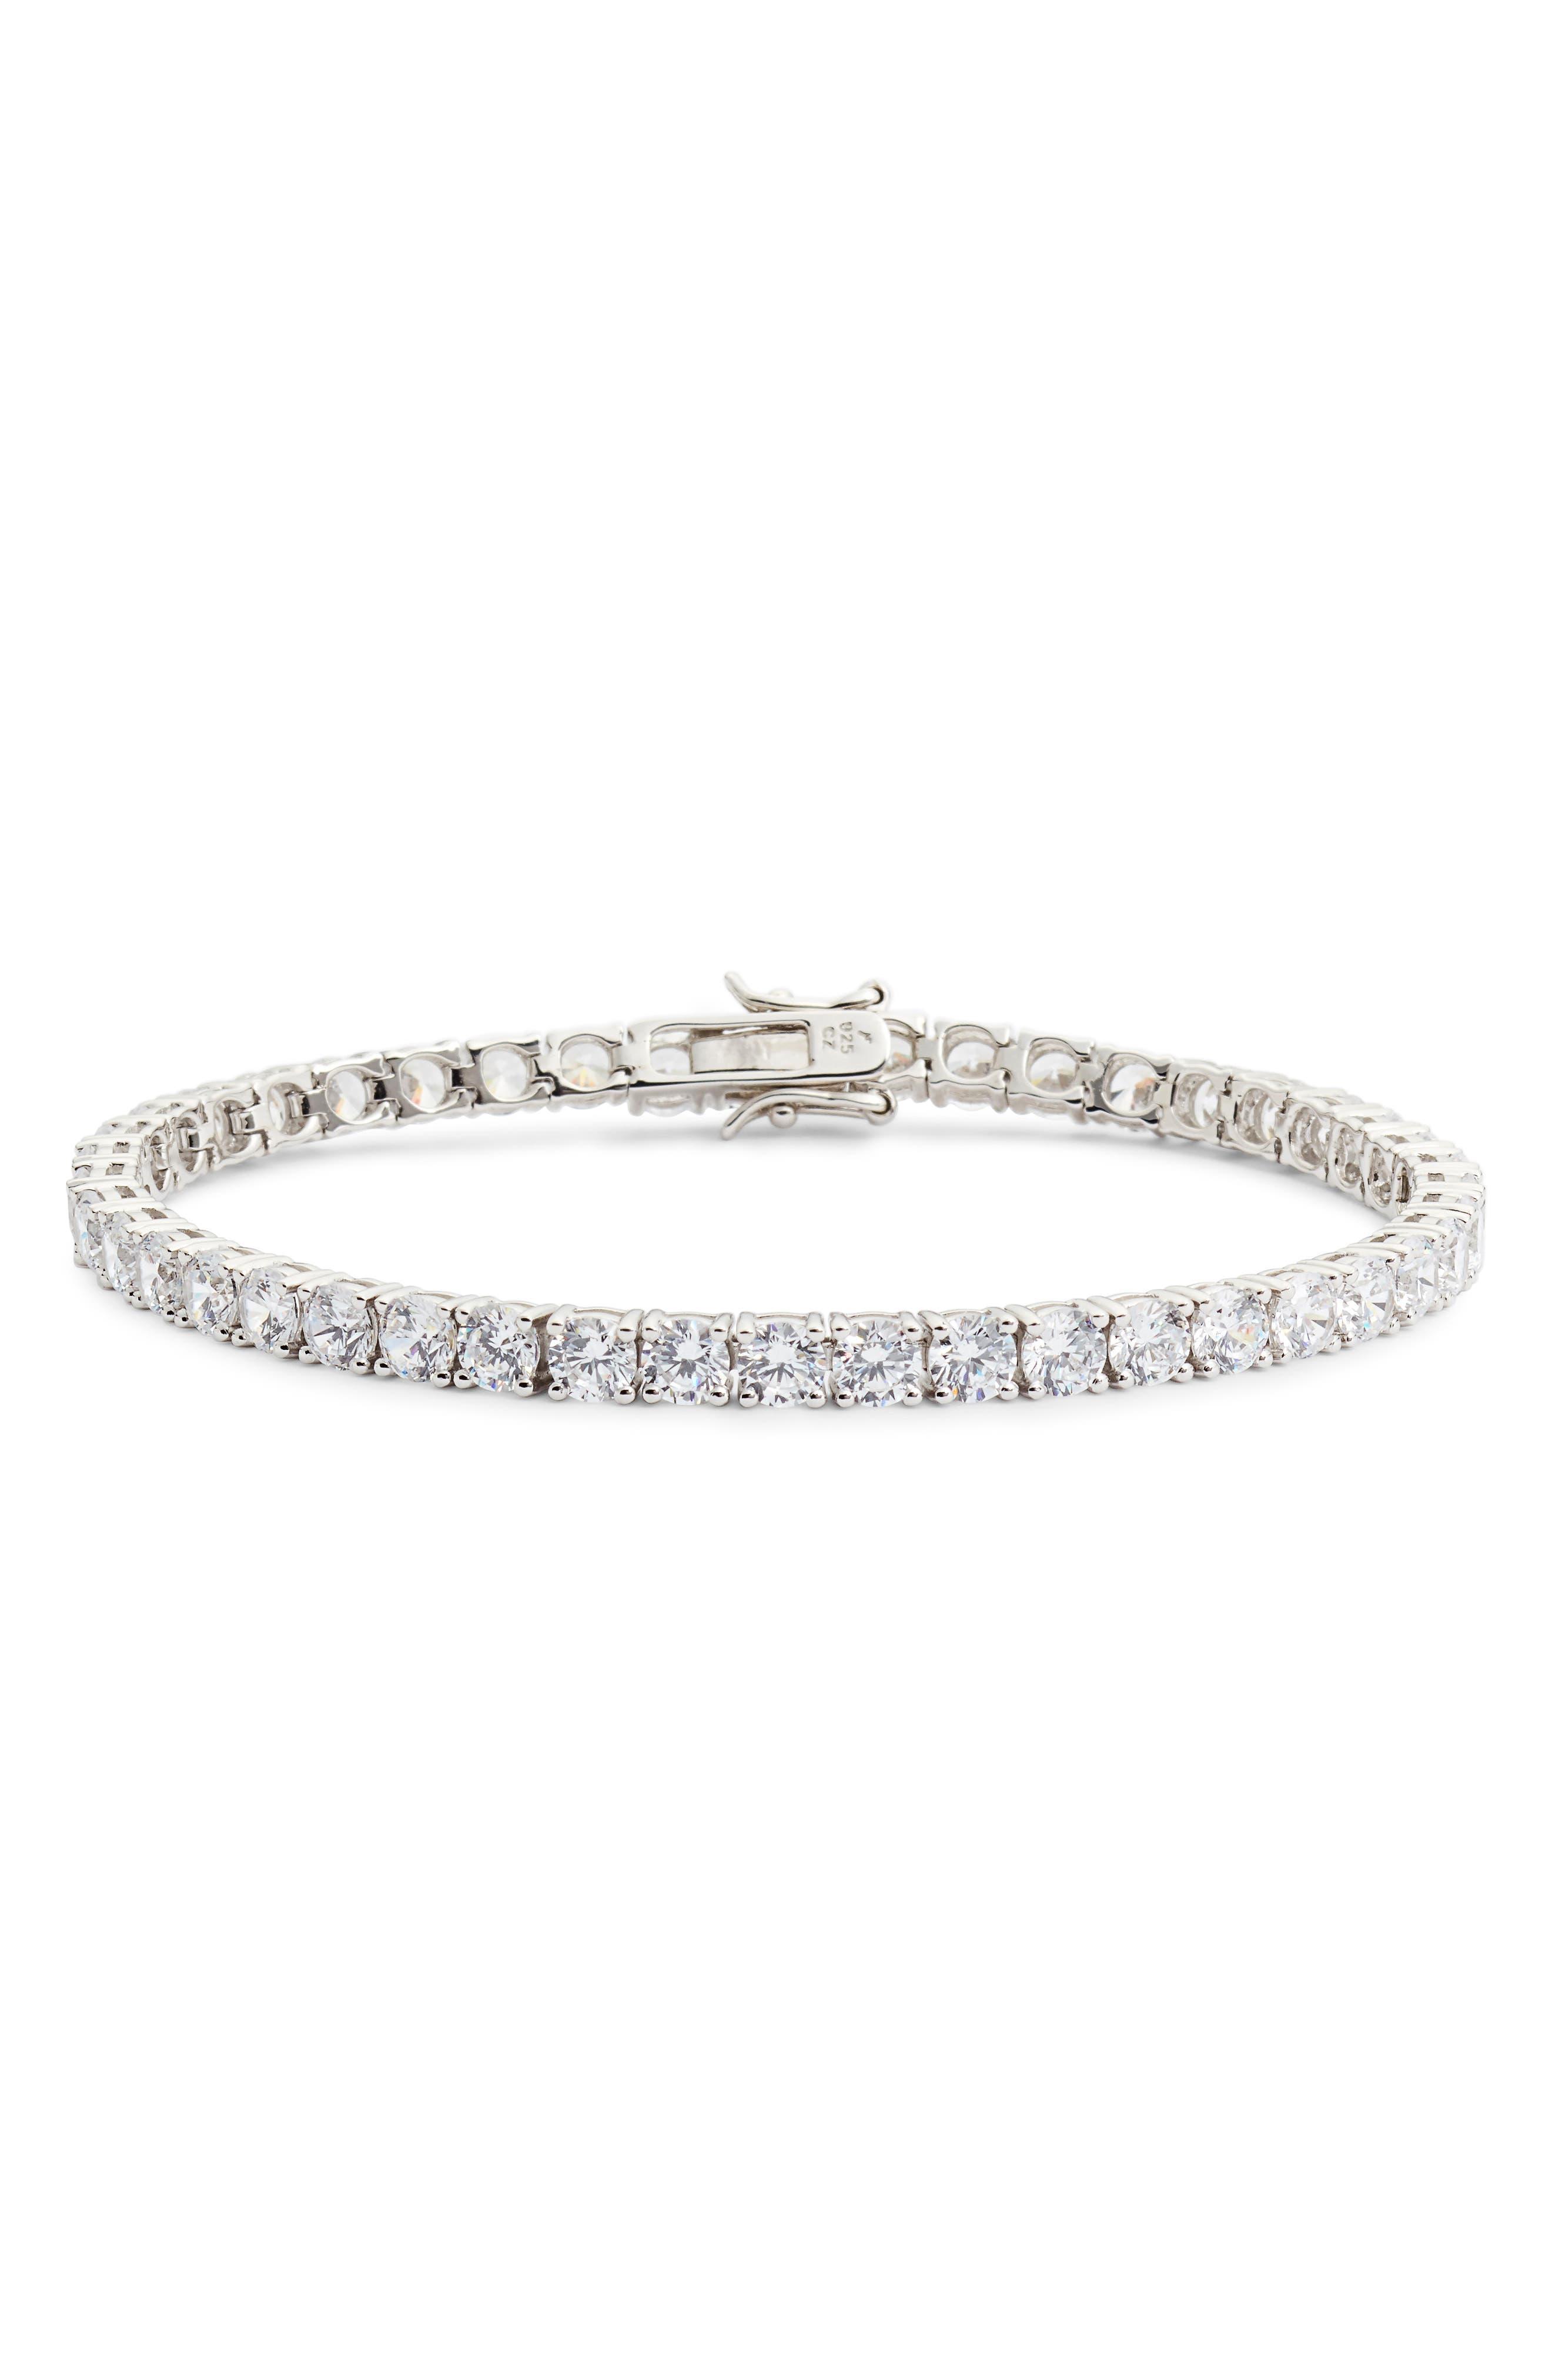 Cubic Zirconia Tennis Bracelet,                         Main,                         color, Platinum